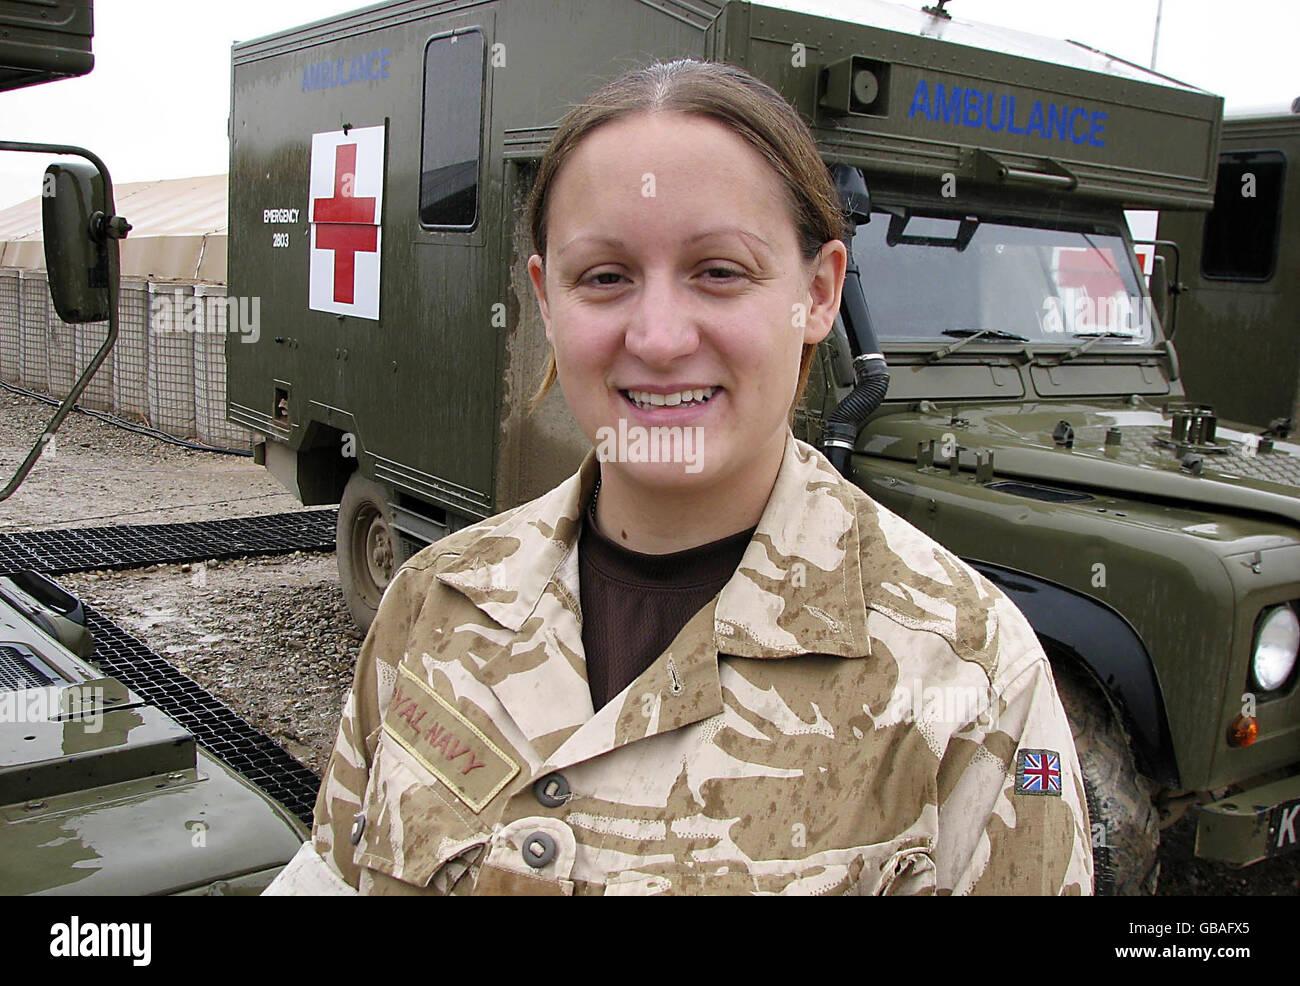 British troops in Afghanistan - Stock Image